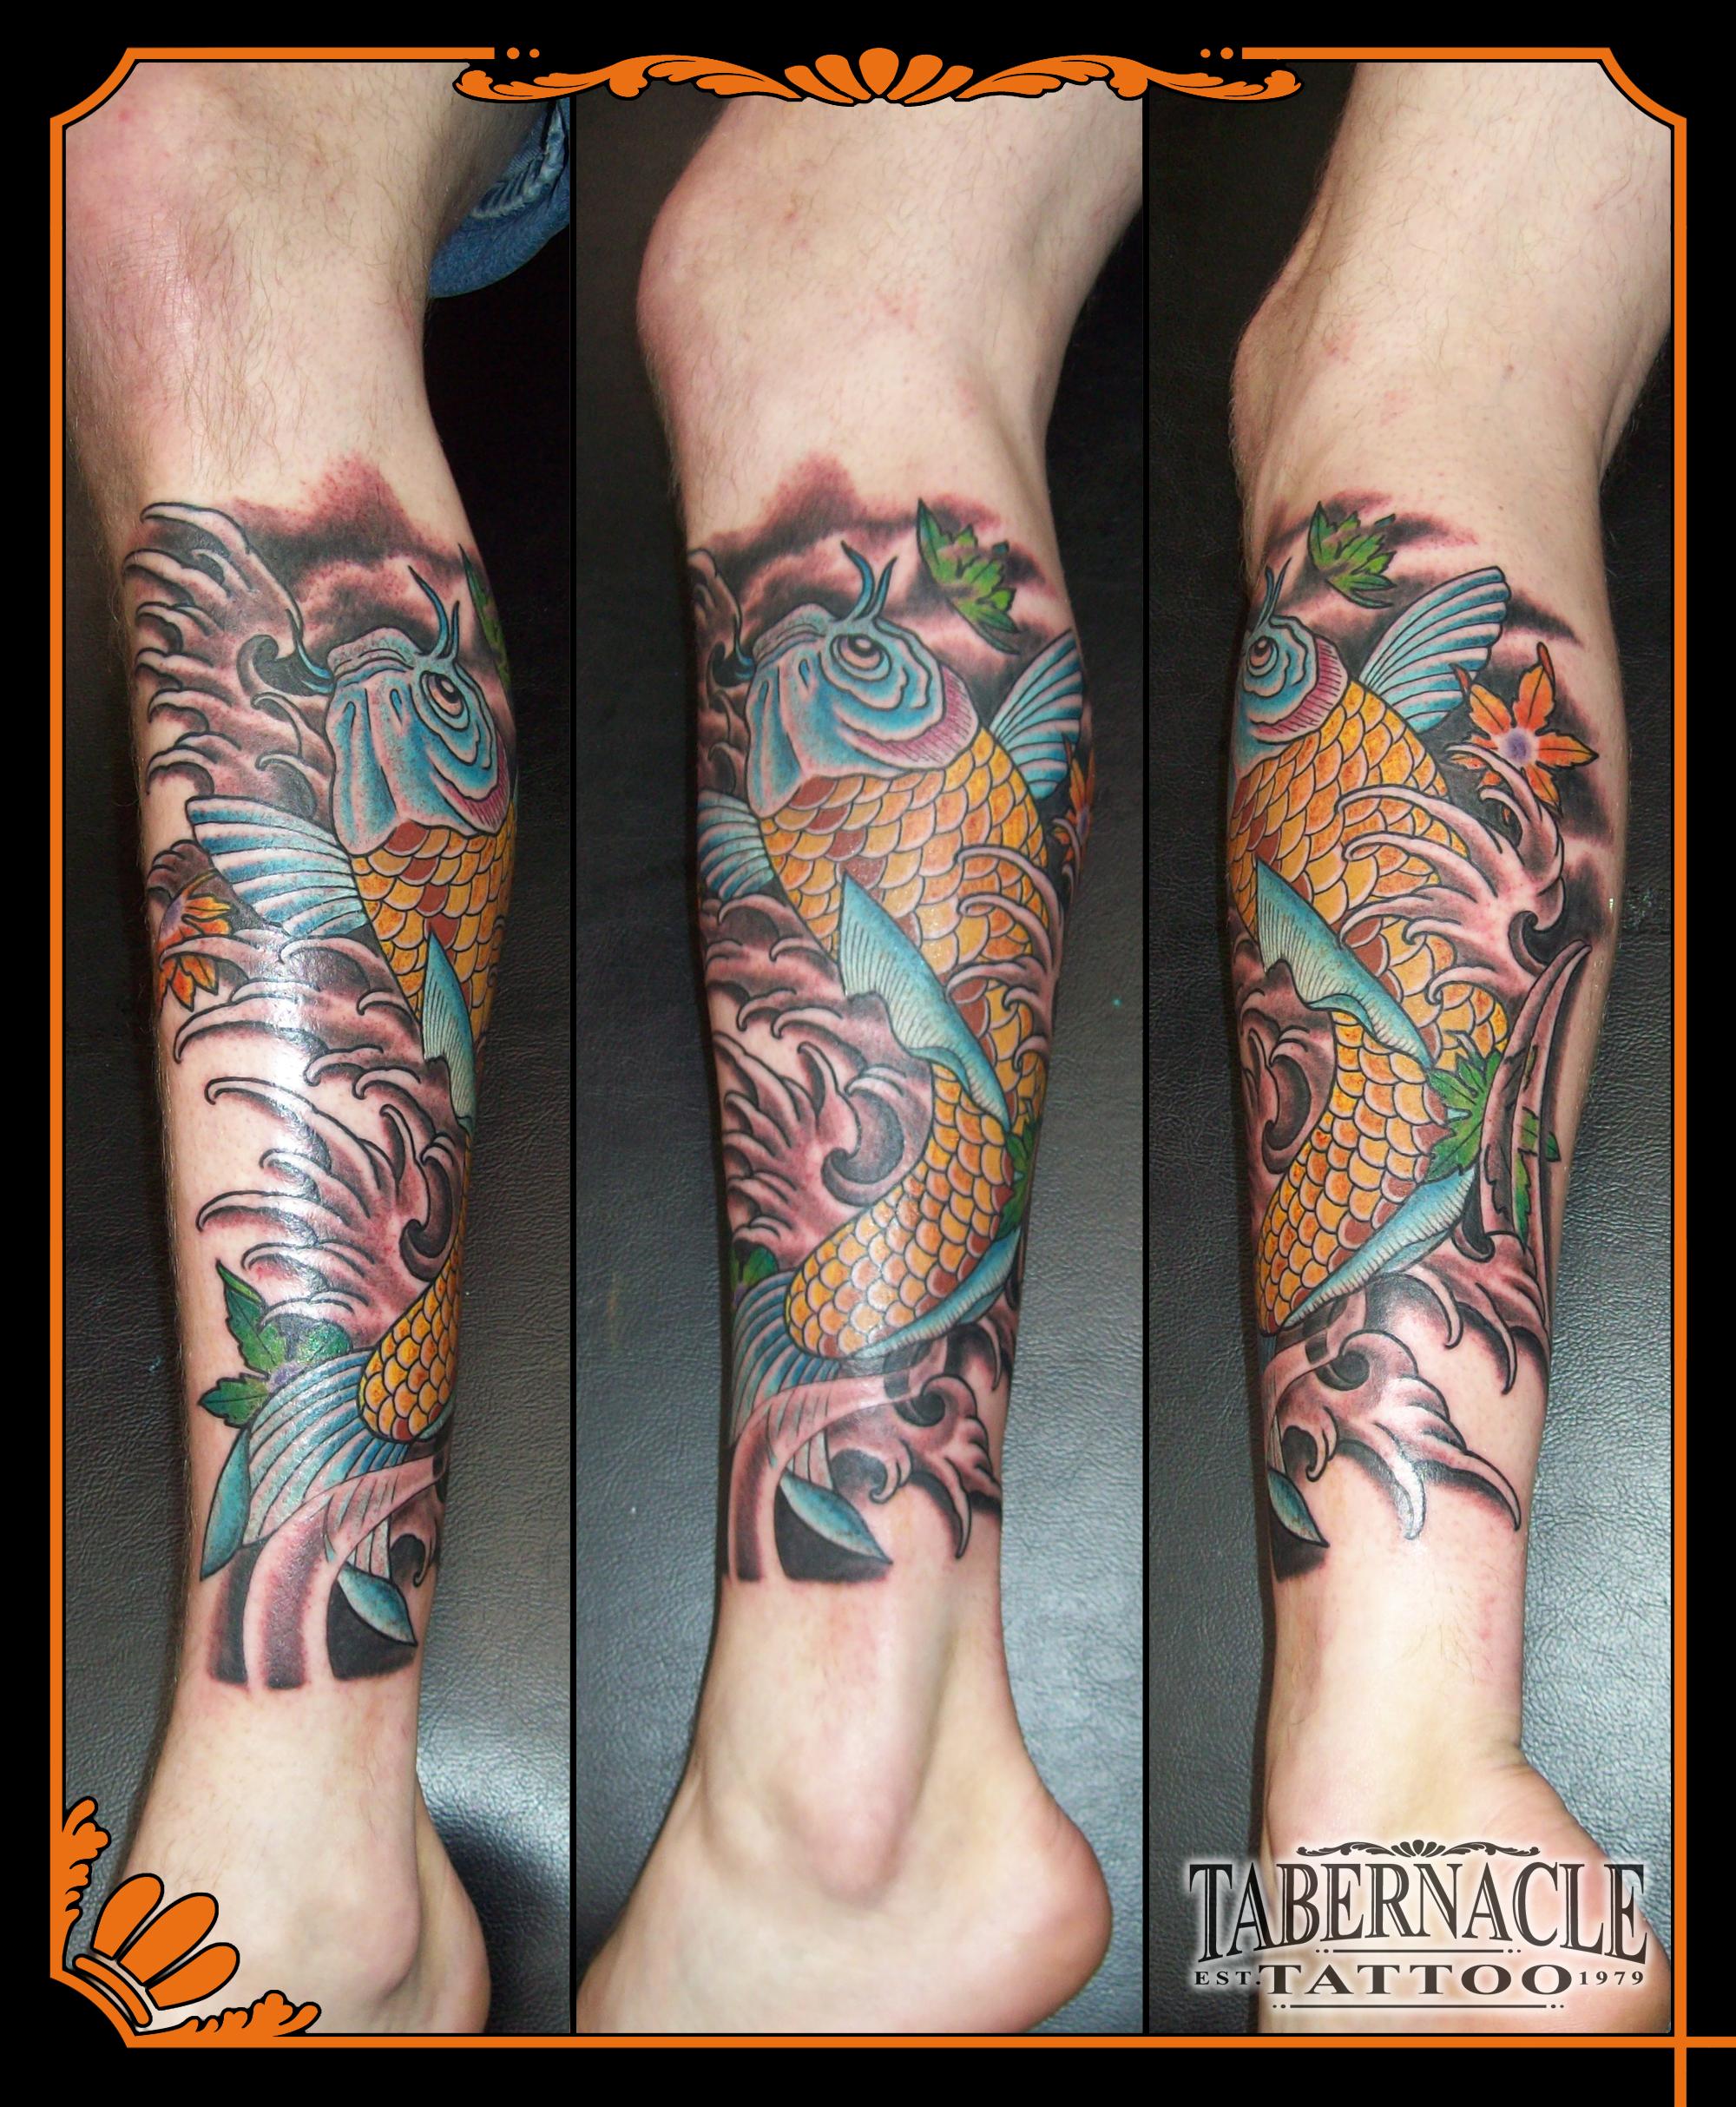 Tabernacle tattoo tampa koi fish tattoo for Tattoo shops in ybor